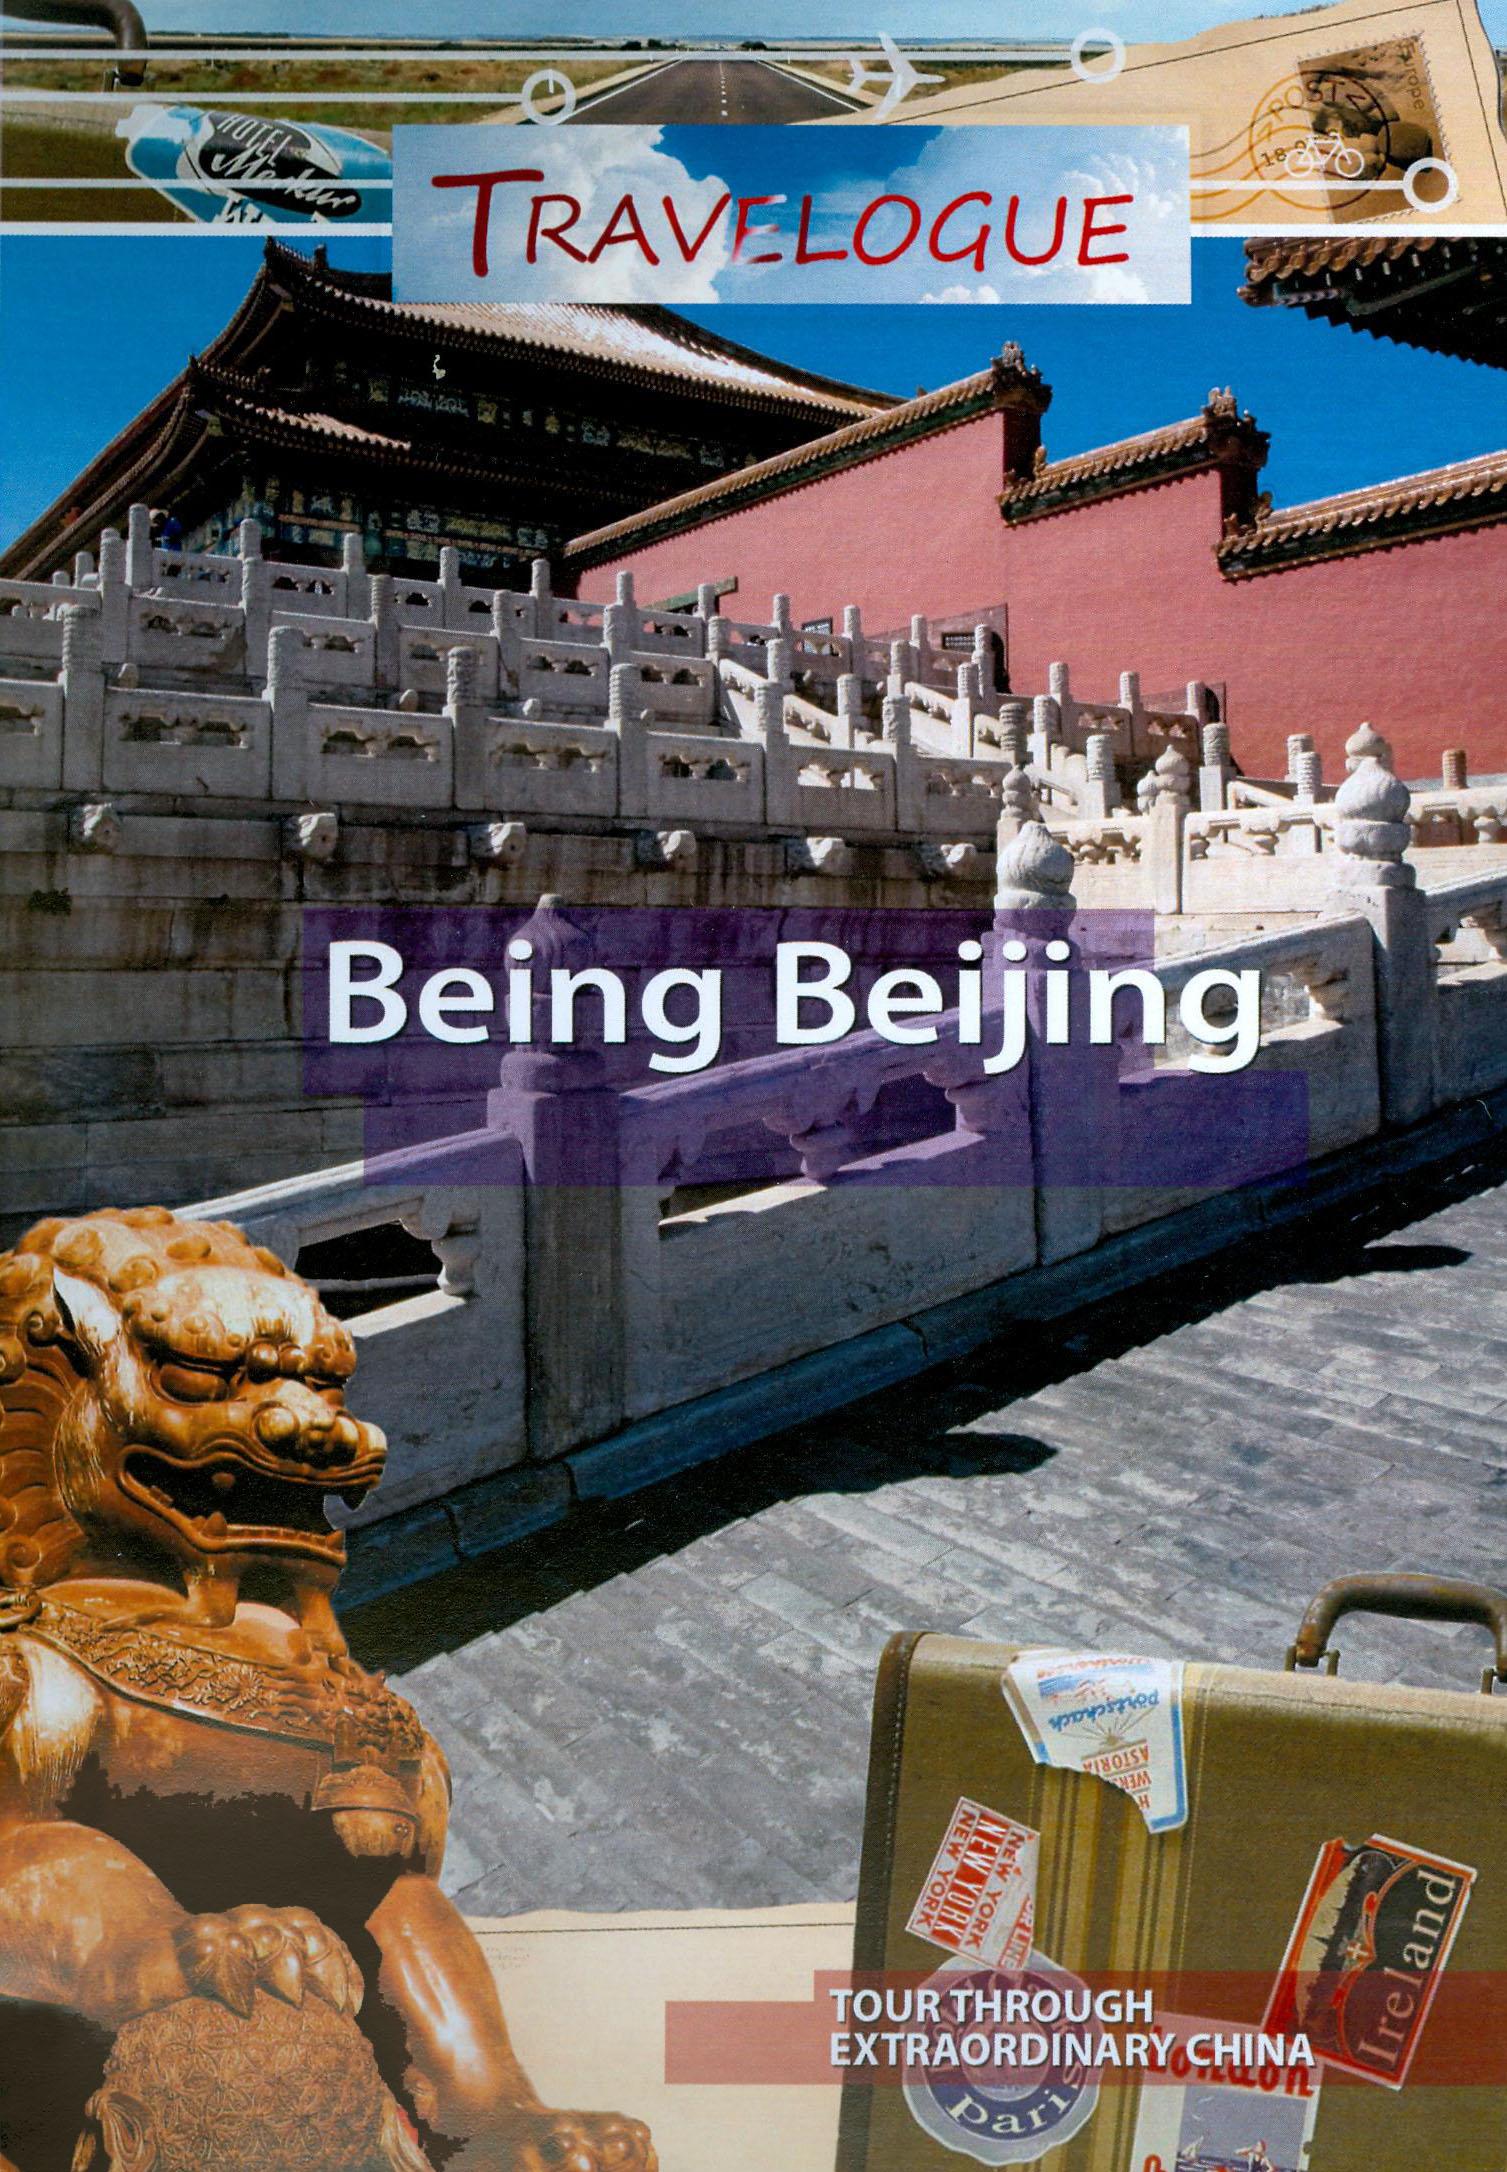 Travelogue 195: Being Beijing